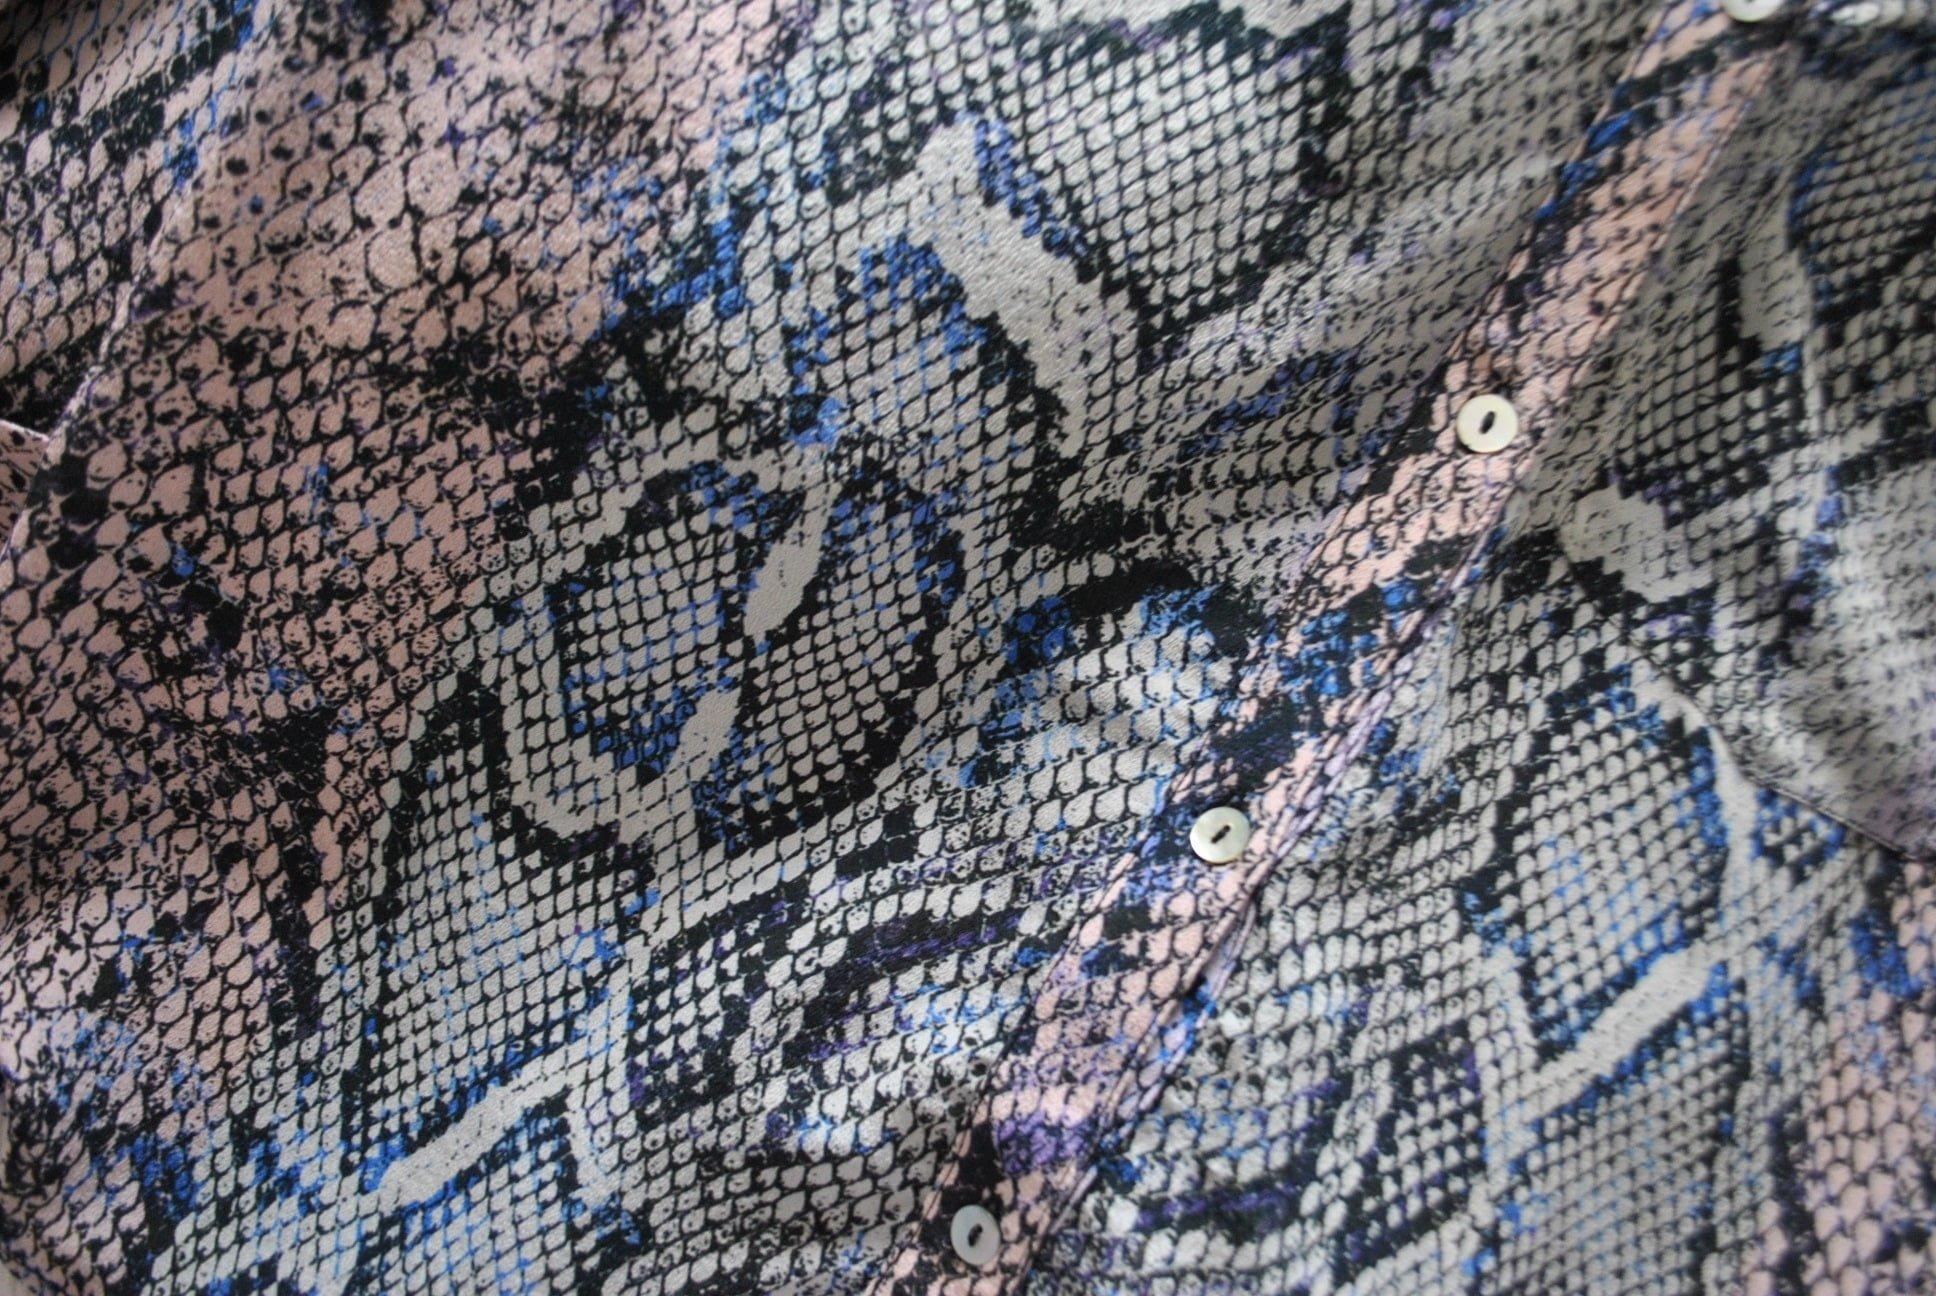 Pyrus-snake-shirt